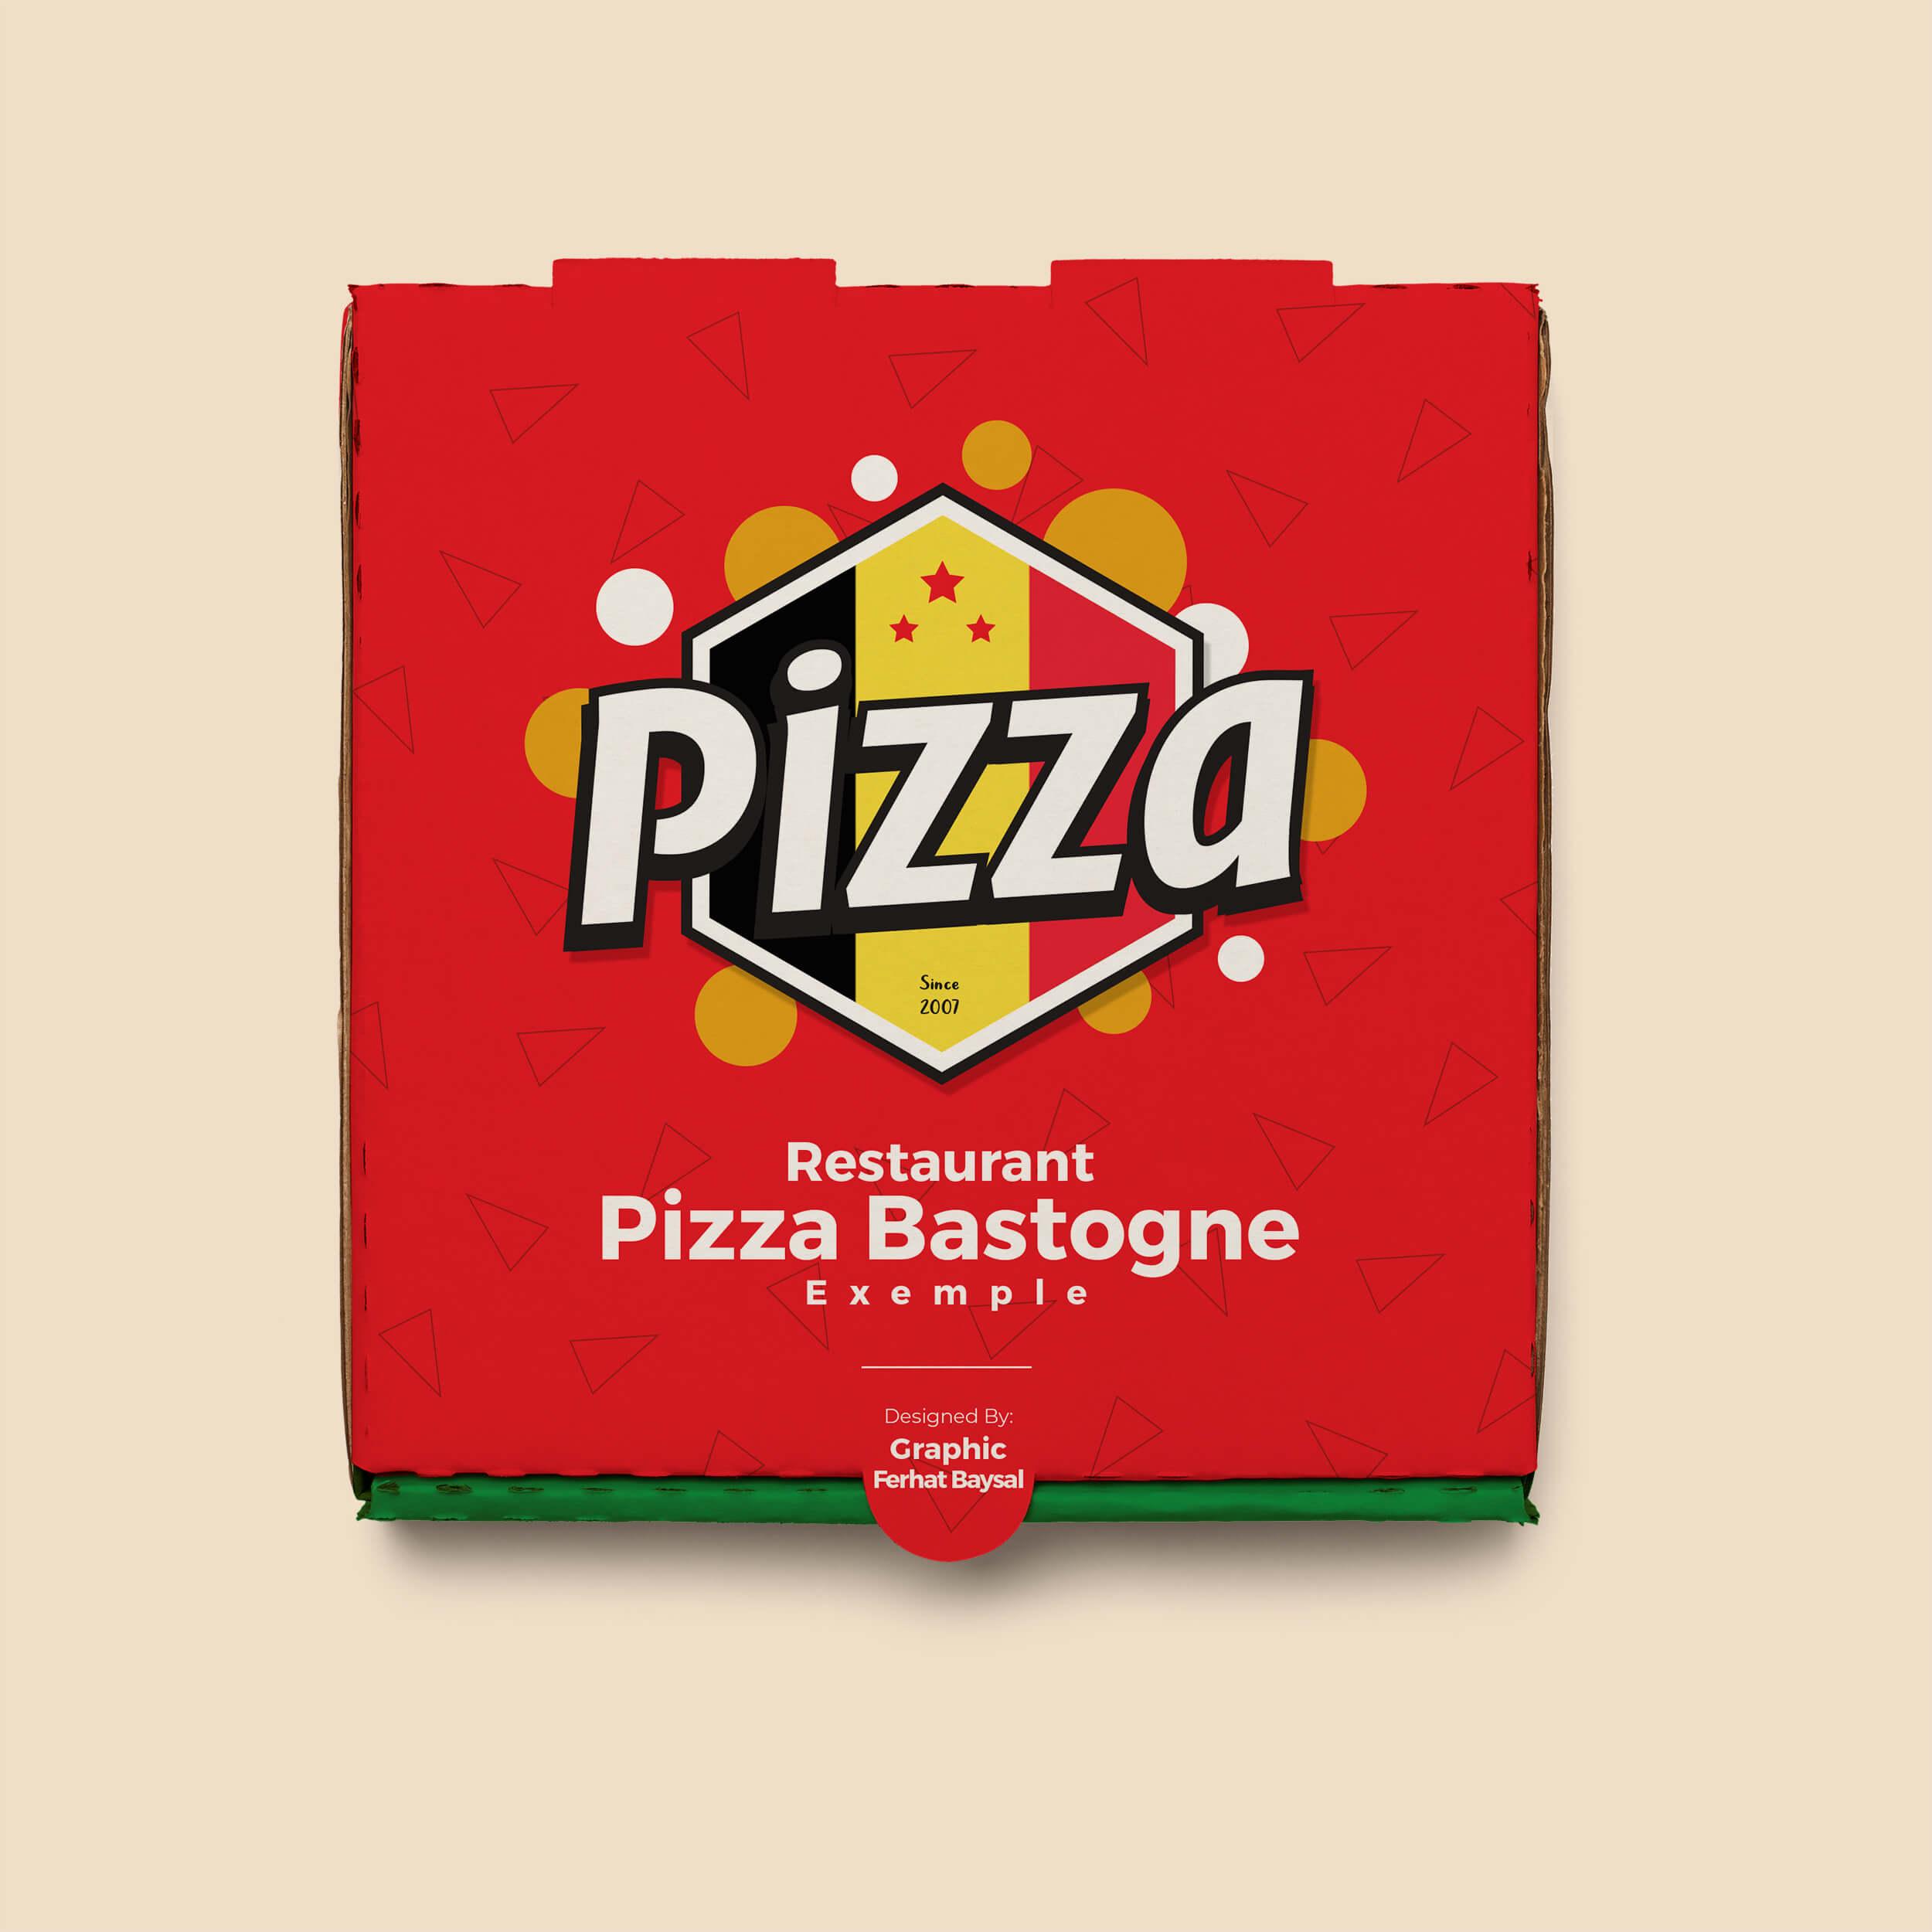 pizza-bastogne